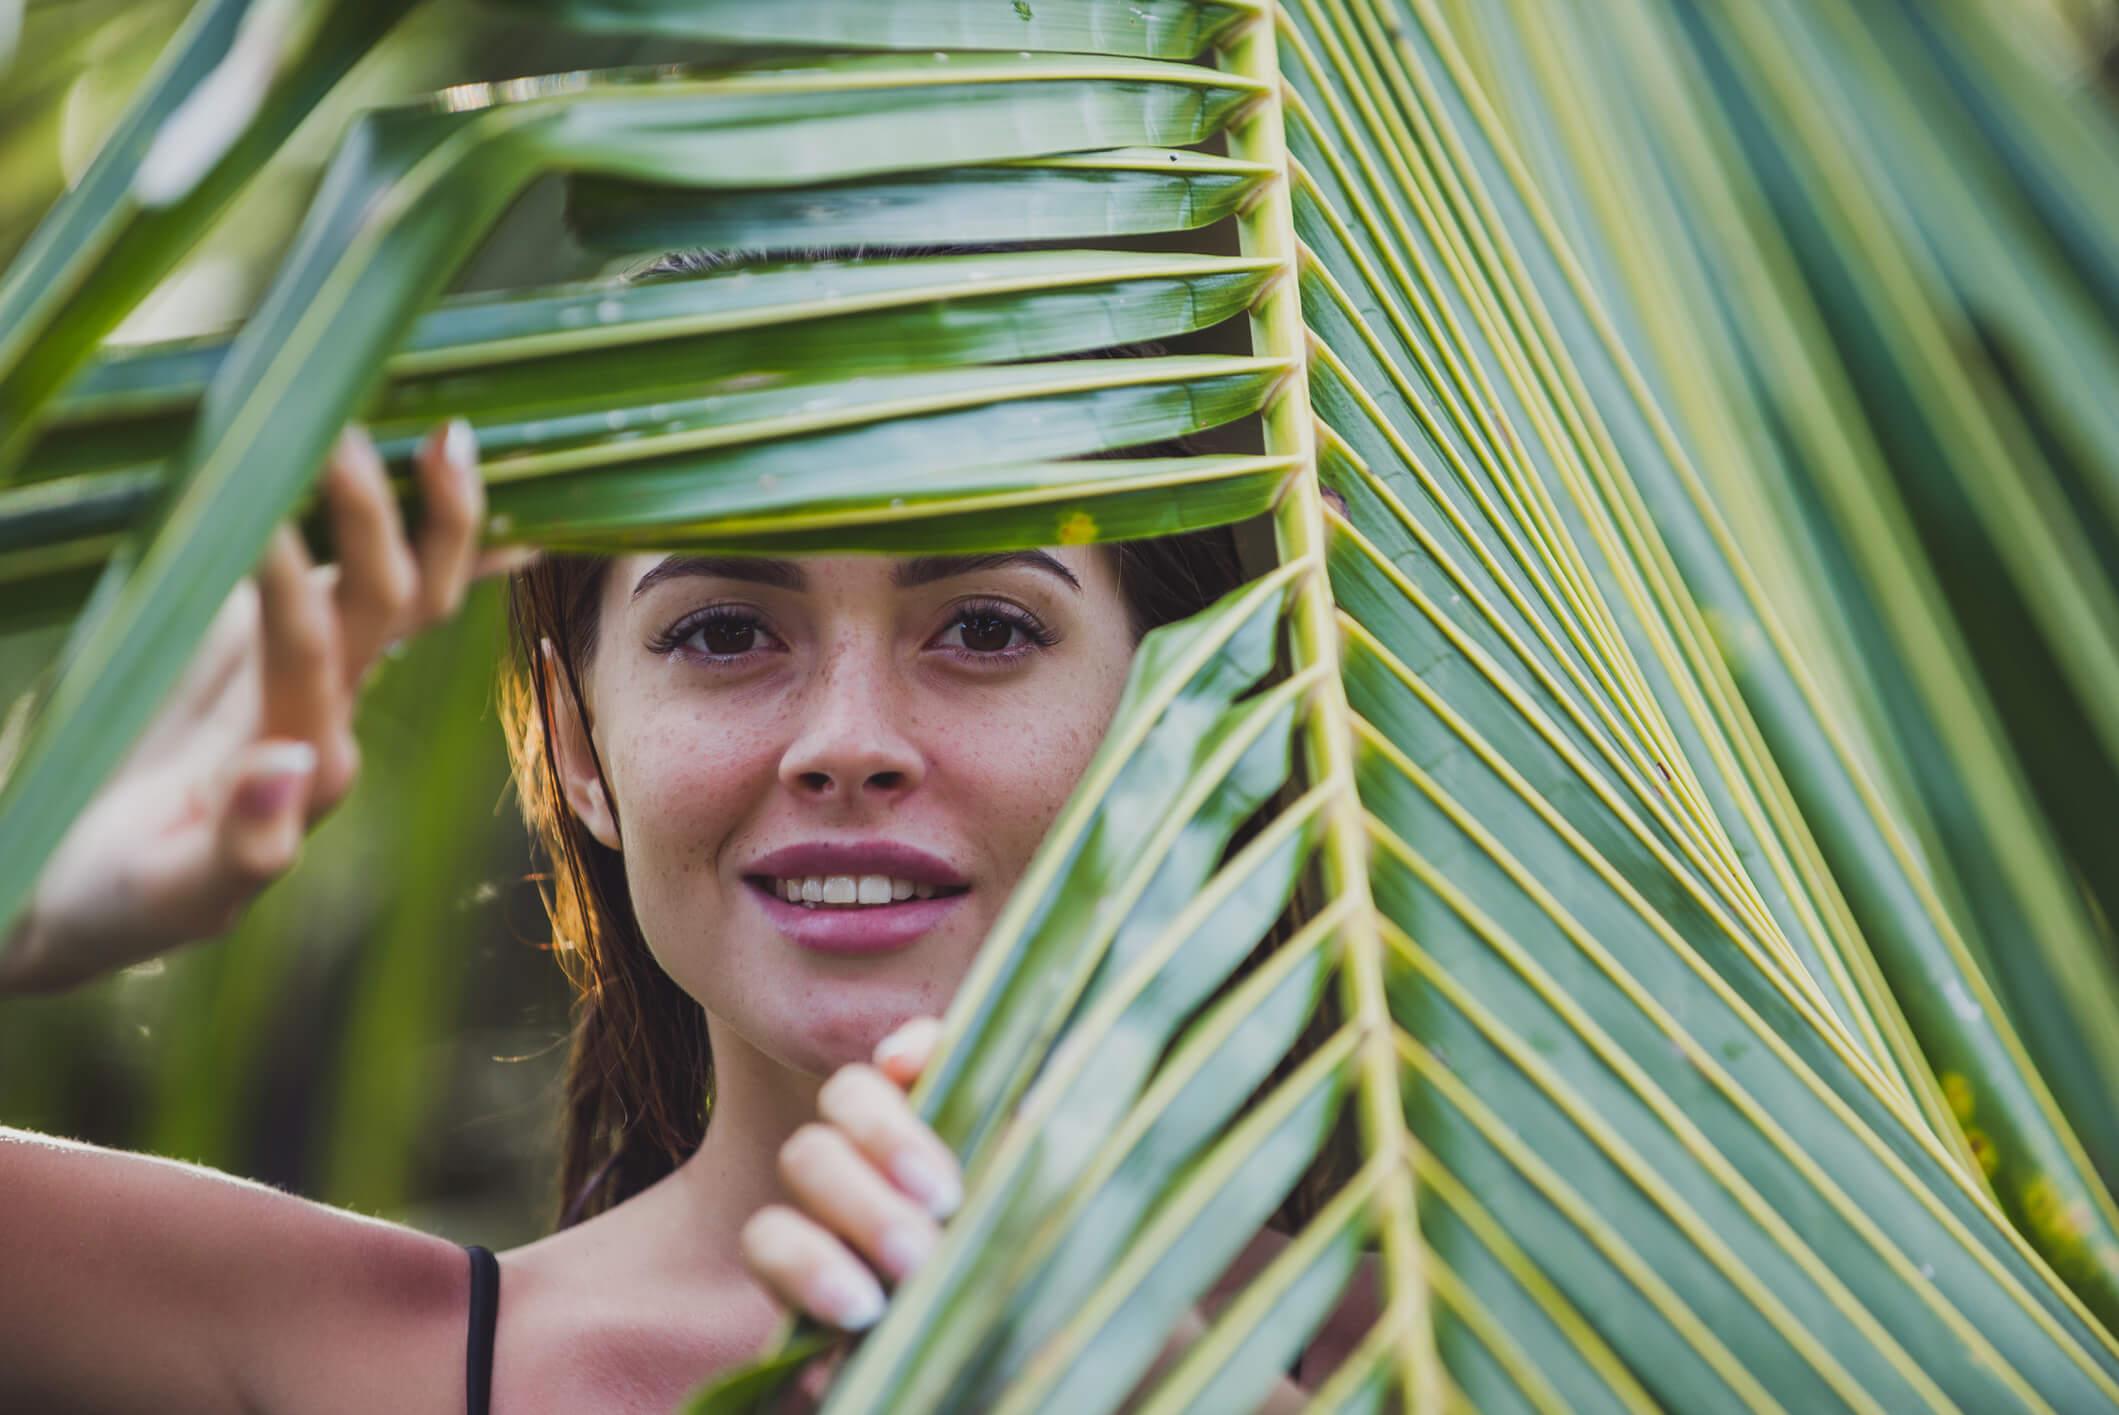 Woman peaking through a plant leaf